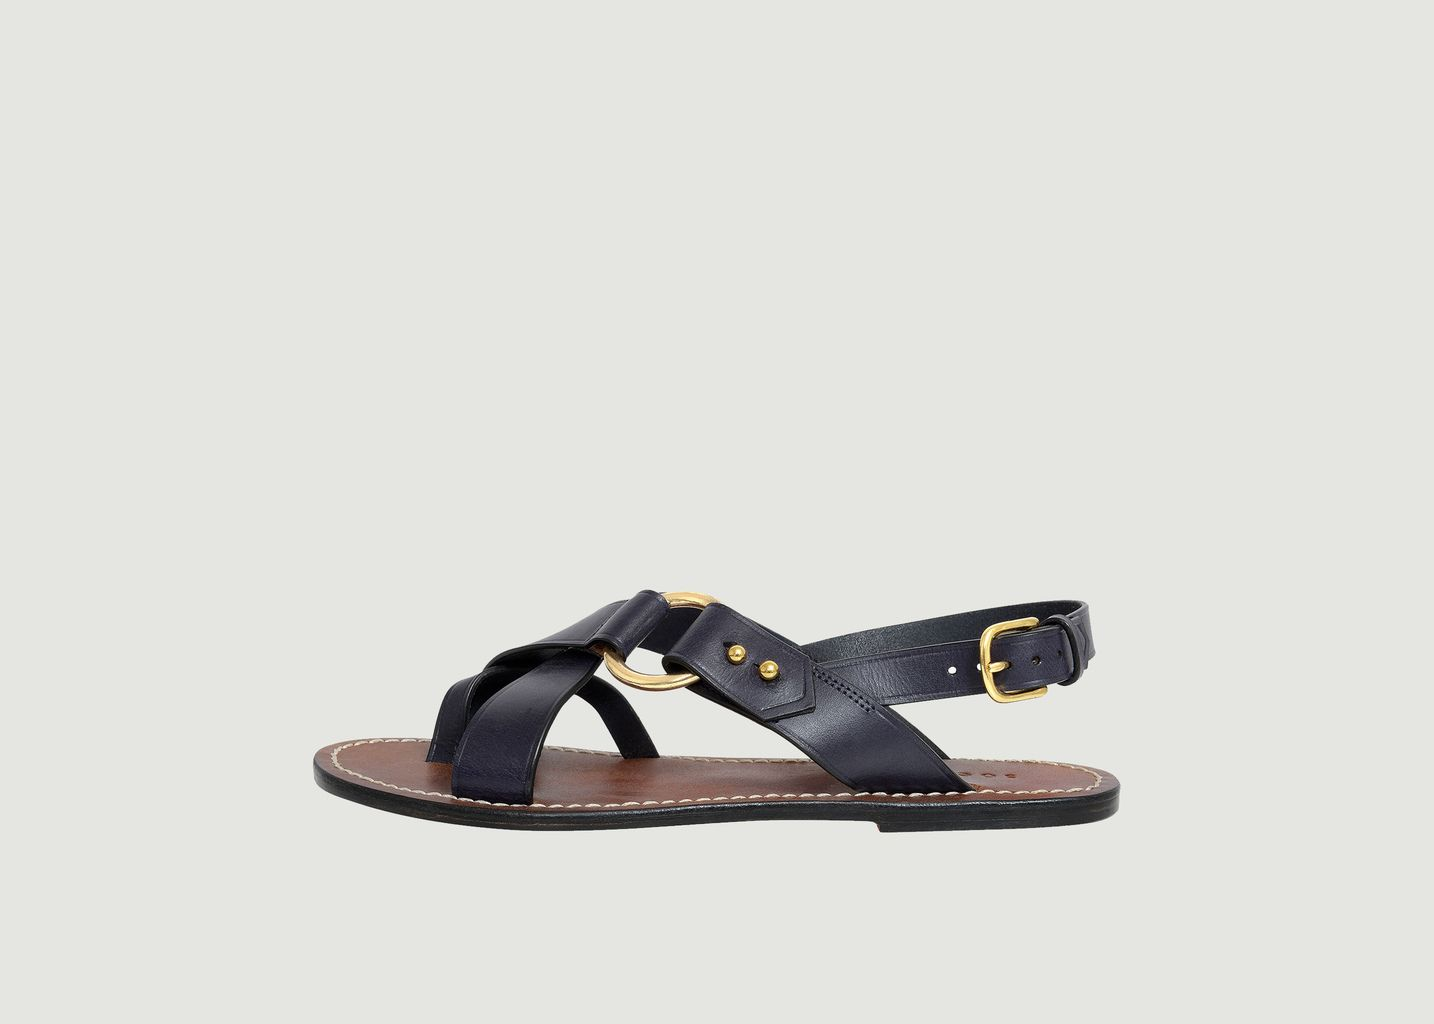 Florence Sandals - Soeur